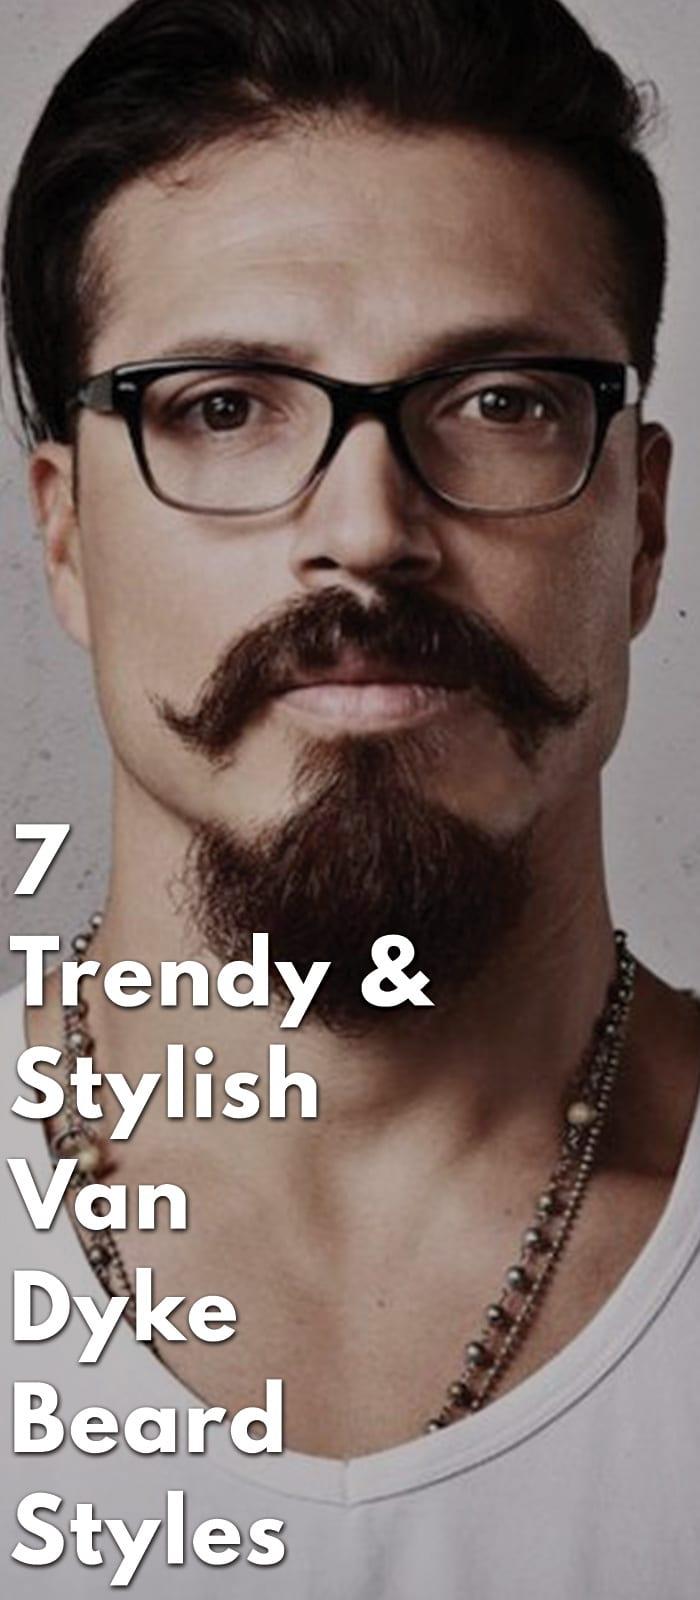 7-Trendy-&-Stylish-Van-Dyke-Beard-Styles-.